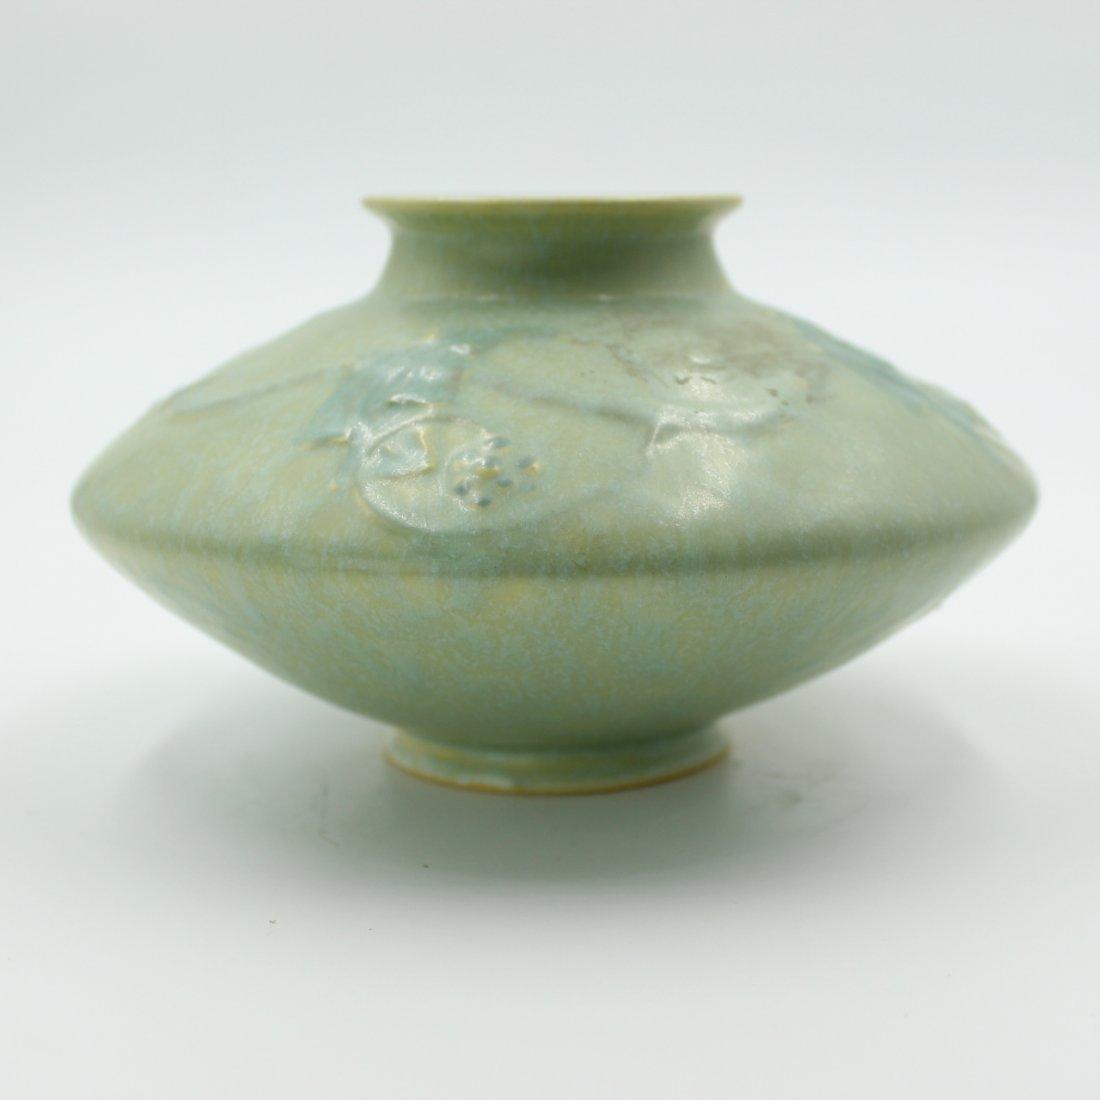 C. 1927 Roseville Cremona Vase #351-4